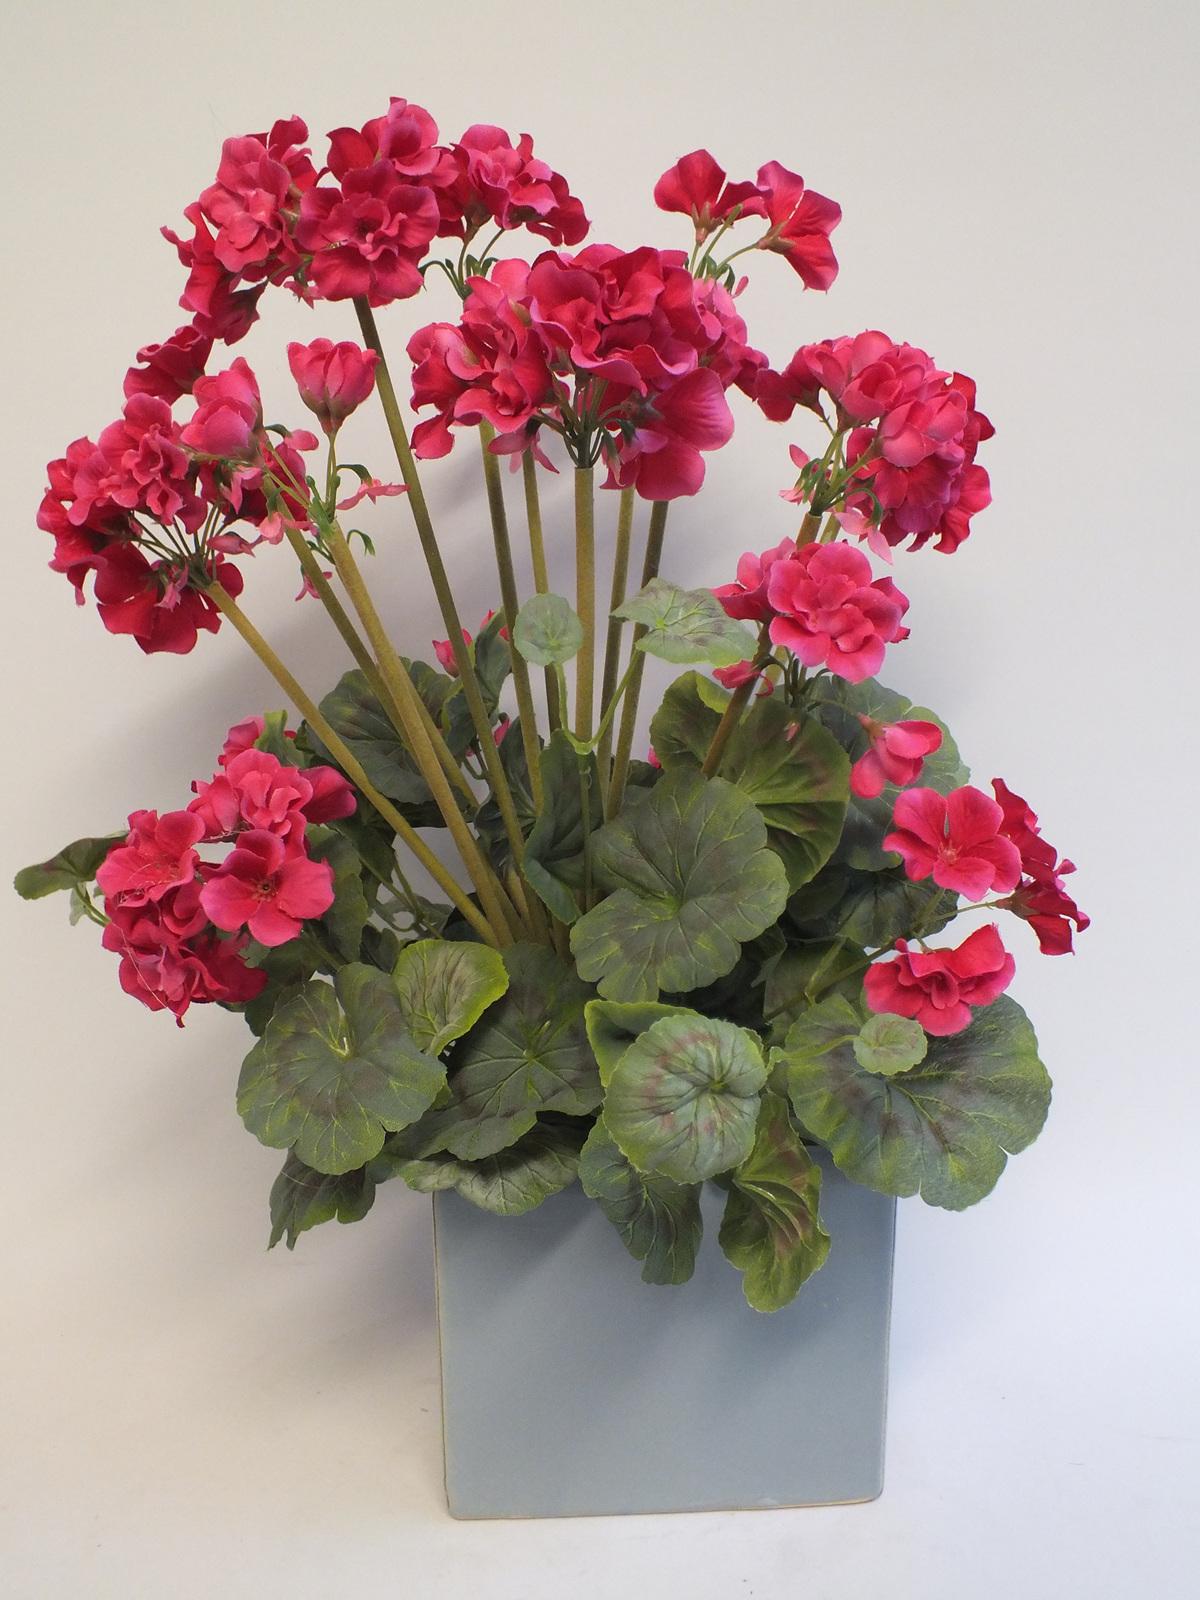 Geranium potted 2101 3 grannys favourite the silk flower company mightylinksfo